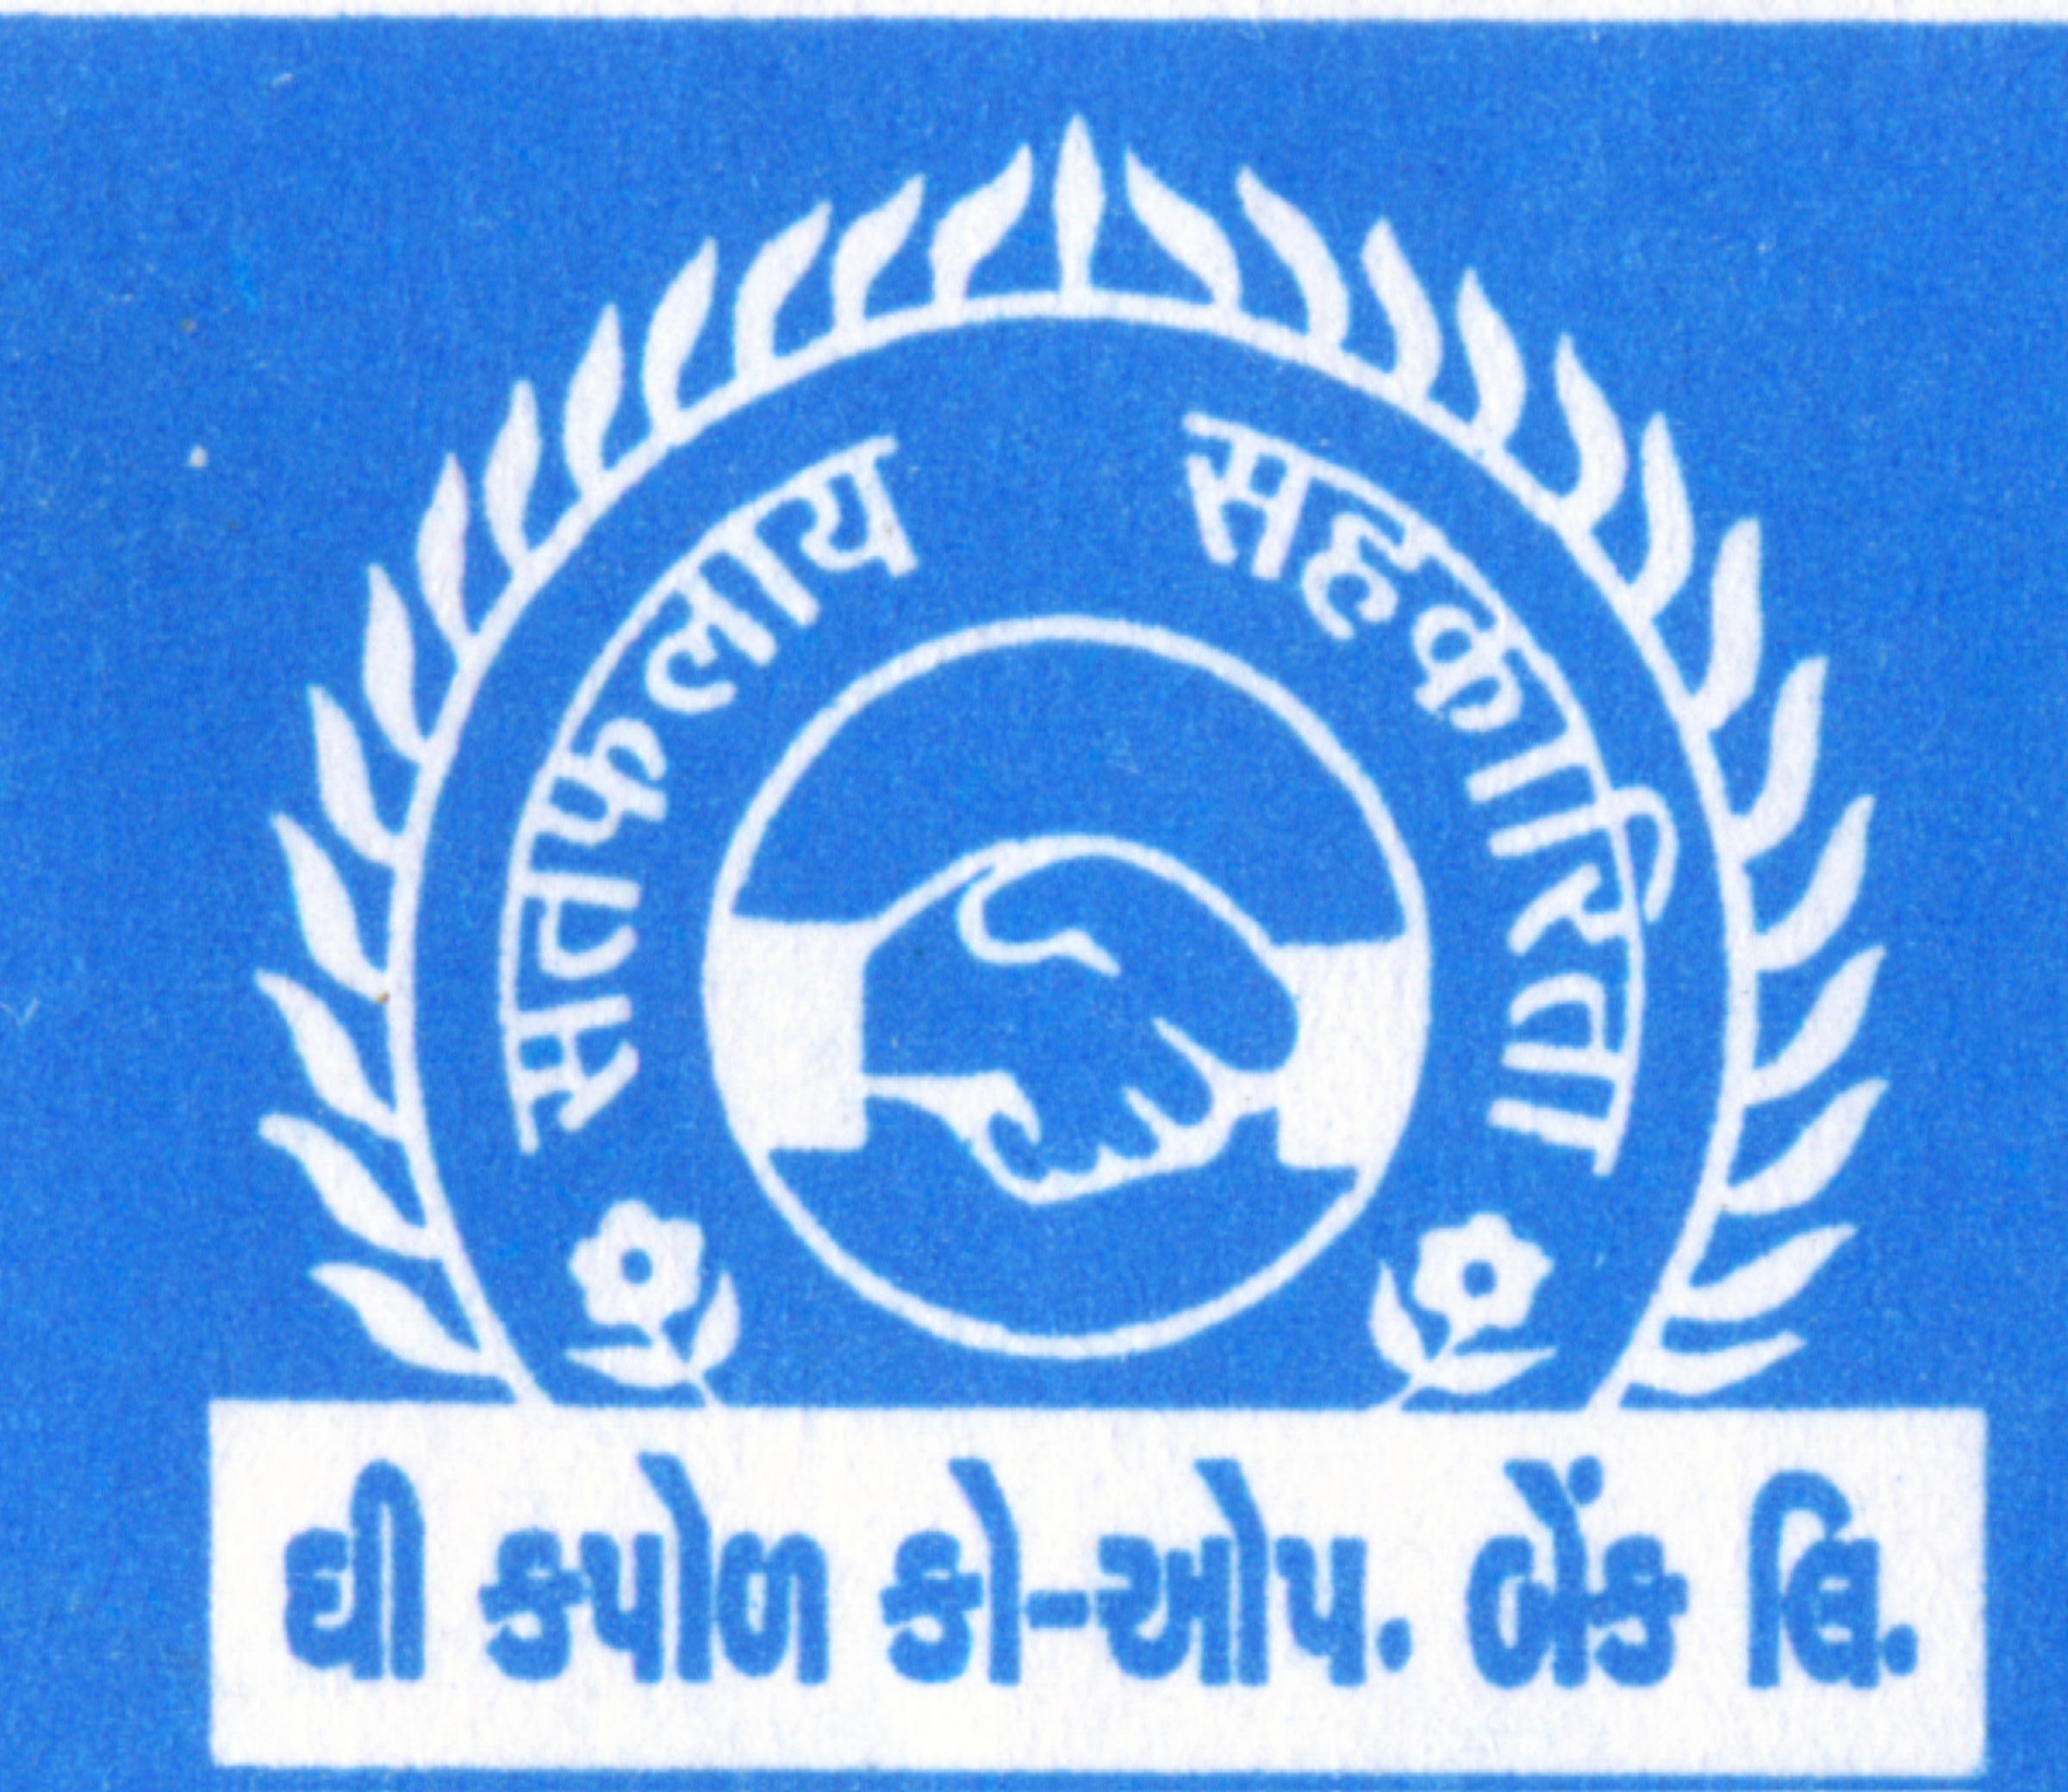 The Kapol Co-Operative Bank Ltd